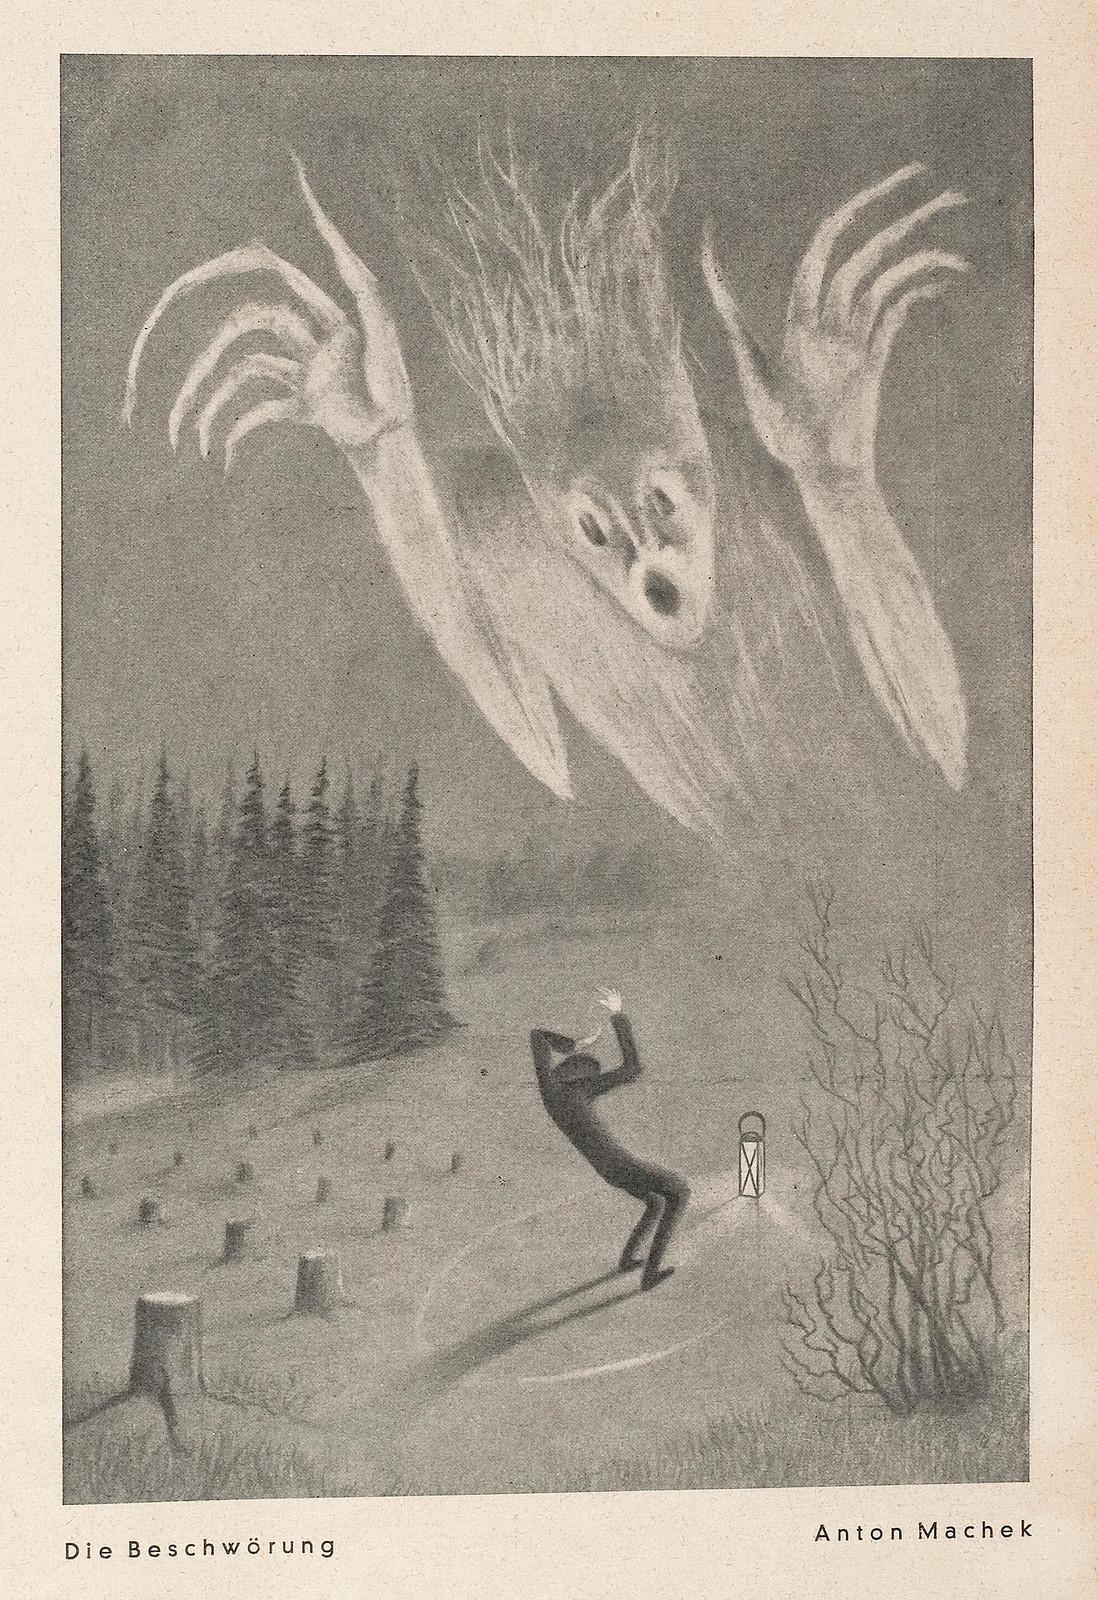 Anton Machek - The Incantation, 1931